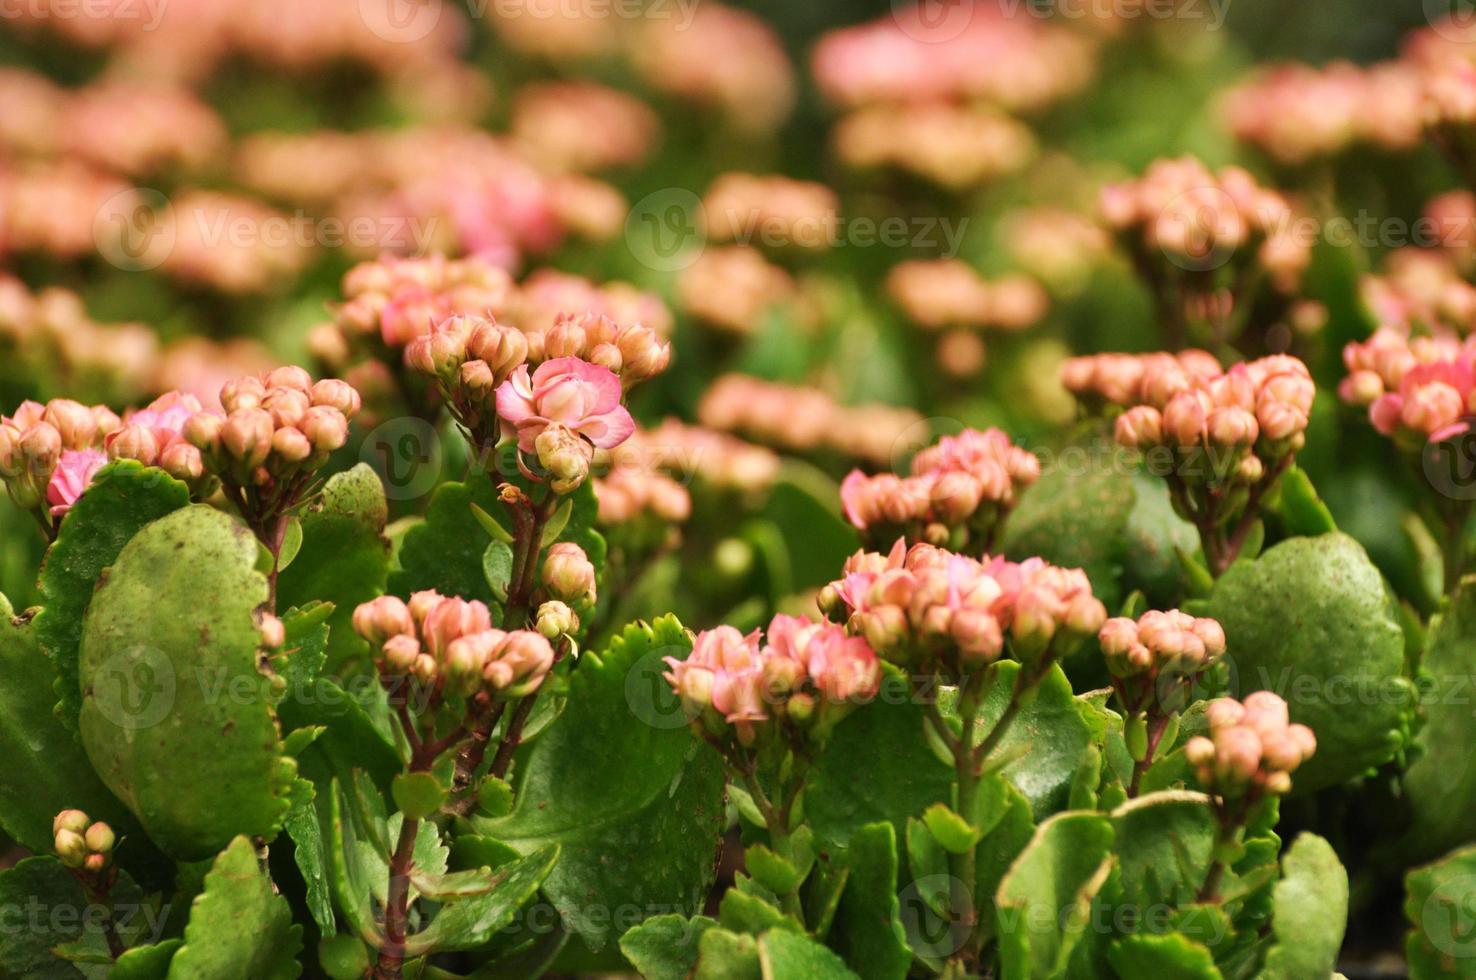 rosa kalanchoe blommor foto